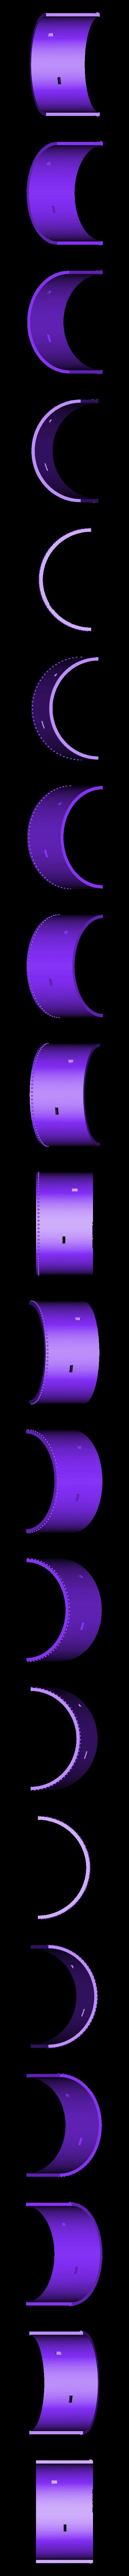 Boiler_Section_3-_SCALED_Part_2.STL Download free STL file 4-8-8-4 Big Boy Locomotive • 3D printer object, RaymondDeLuca